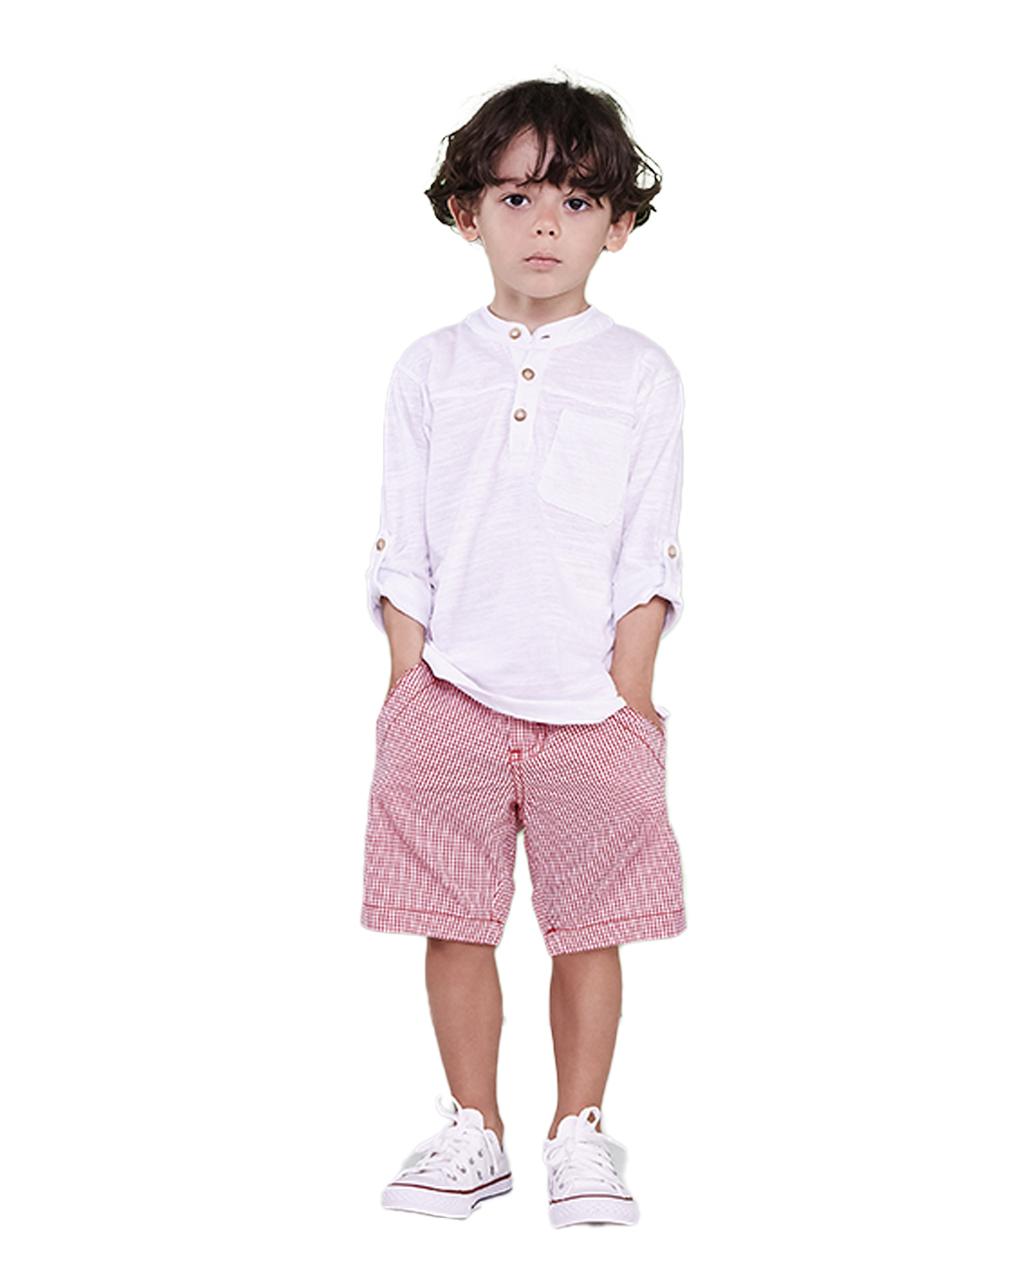 Conjunto Infantil Blusa Flame Branca com Bermuda Xadrez Vermelha Precoce